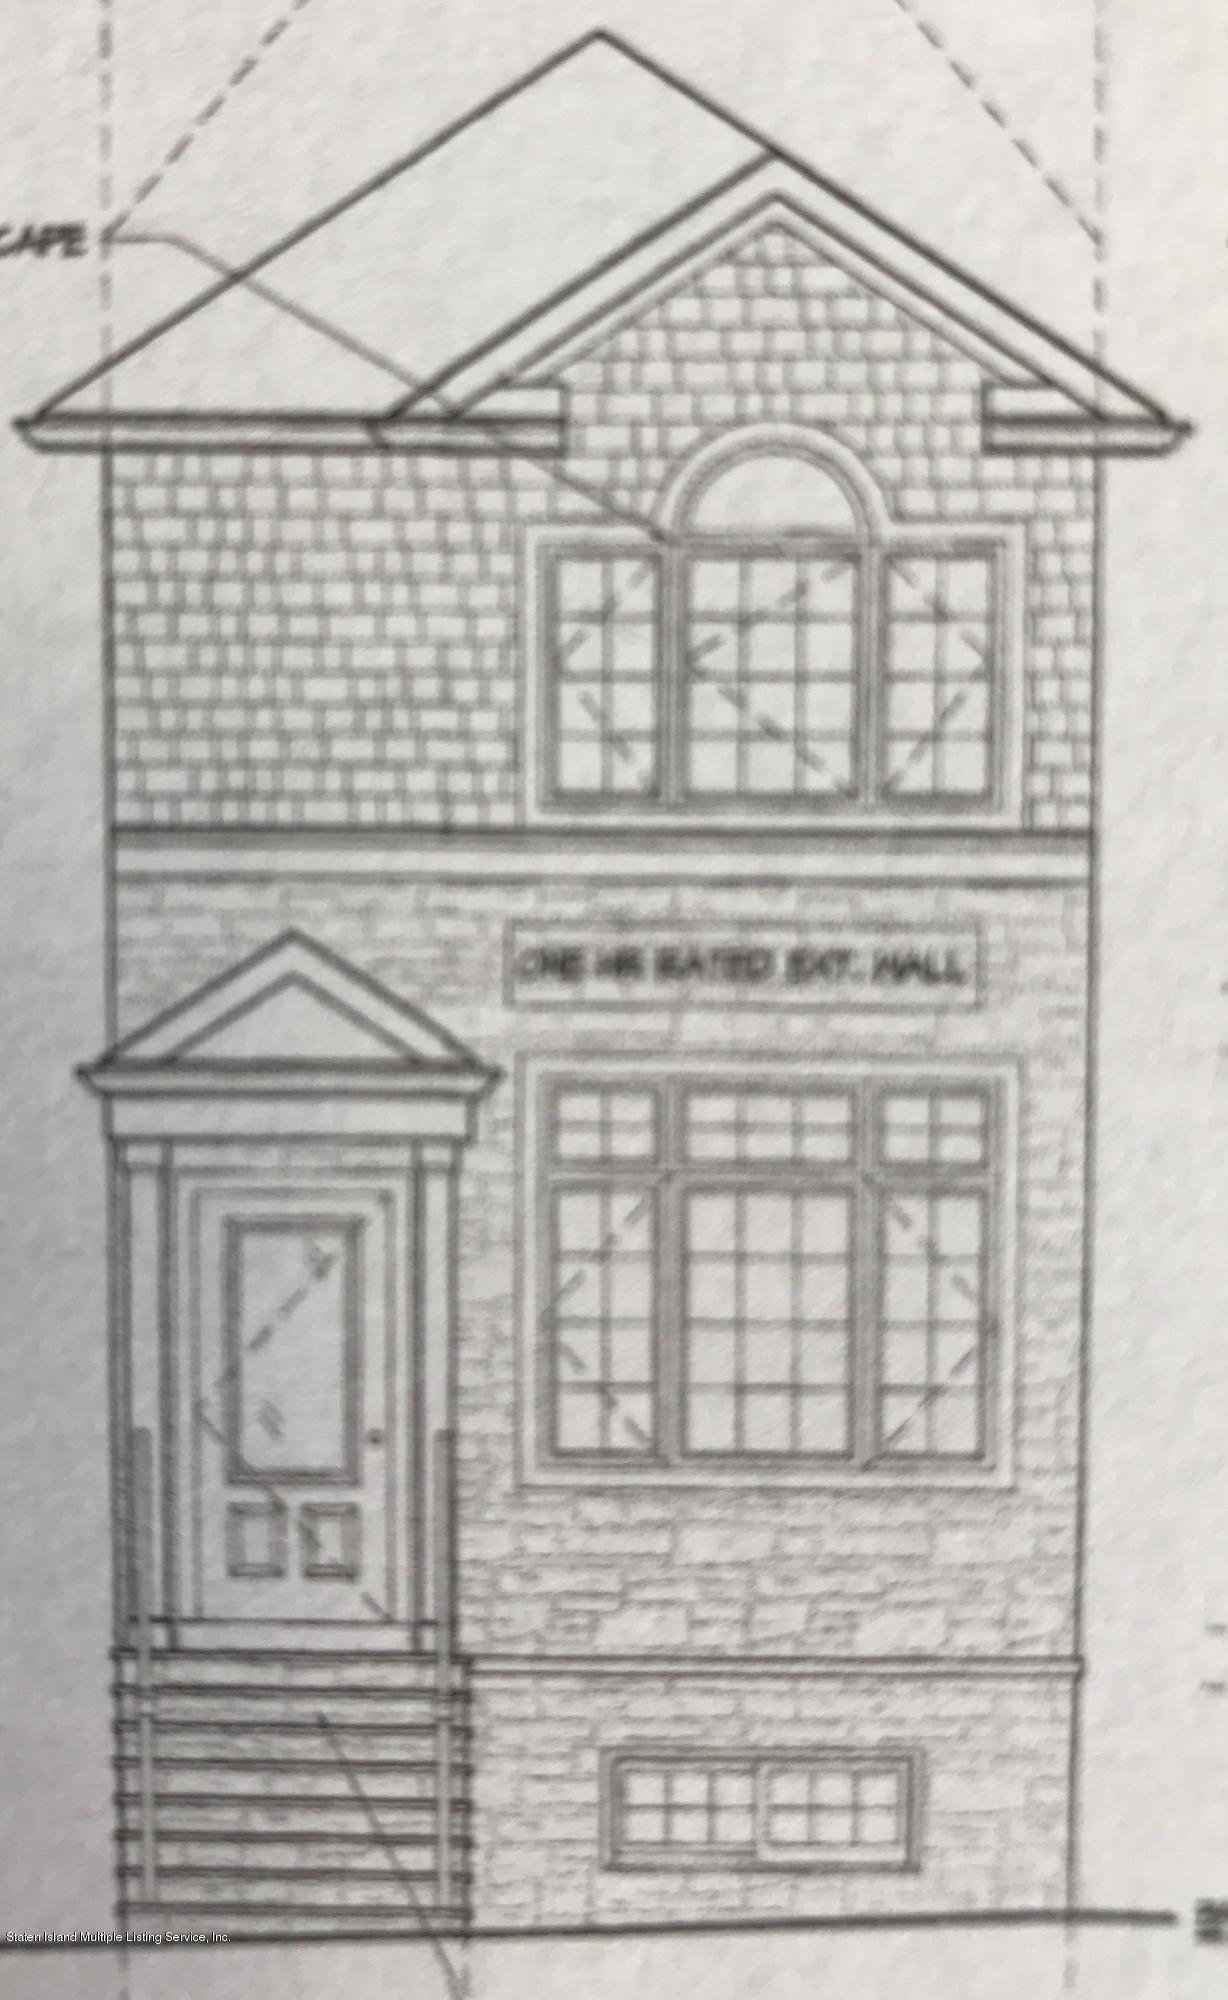 460 Villa Avenue,Staten Island,New York,10302,United States,3 Bedrooms Bedrooms,7 Rooms Rooms,4 BathroomsBathrooms,Residential,Villa,1124422